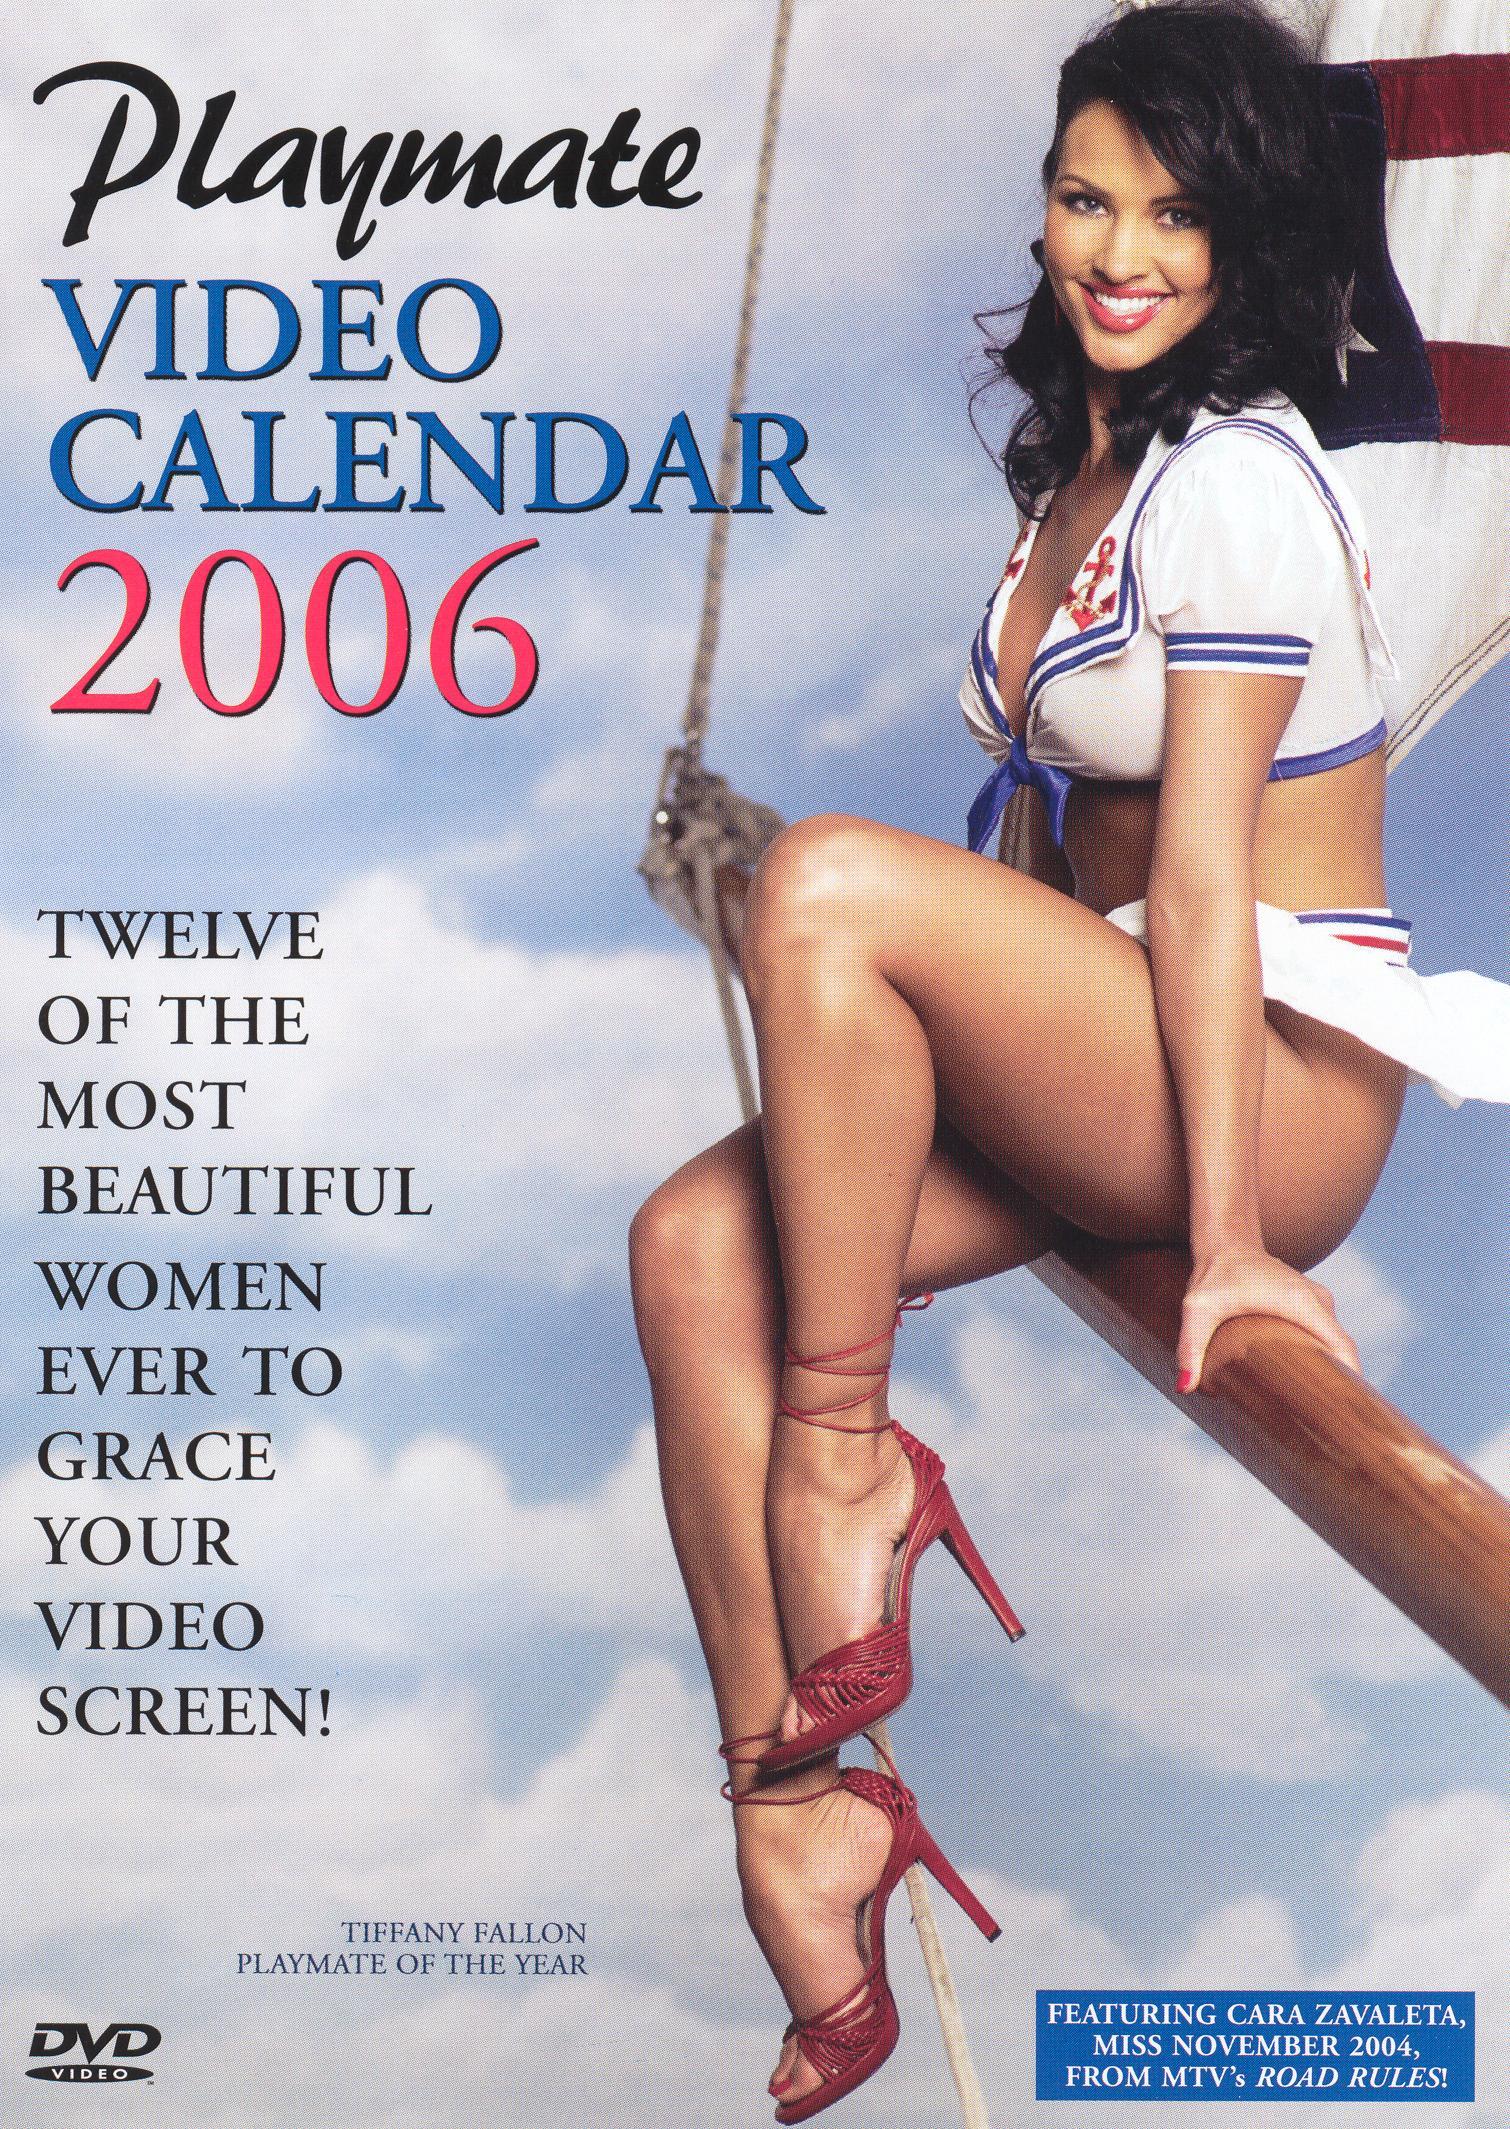 Playboy: 2006 Video Playmate Calendar